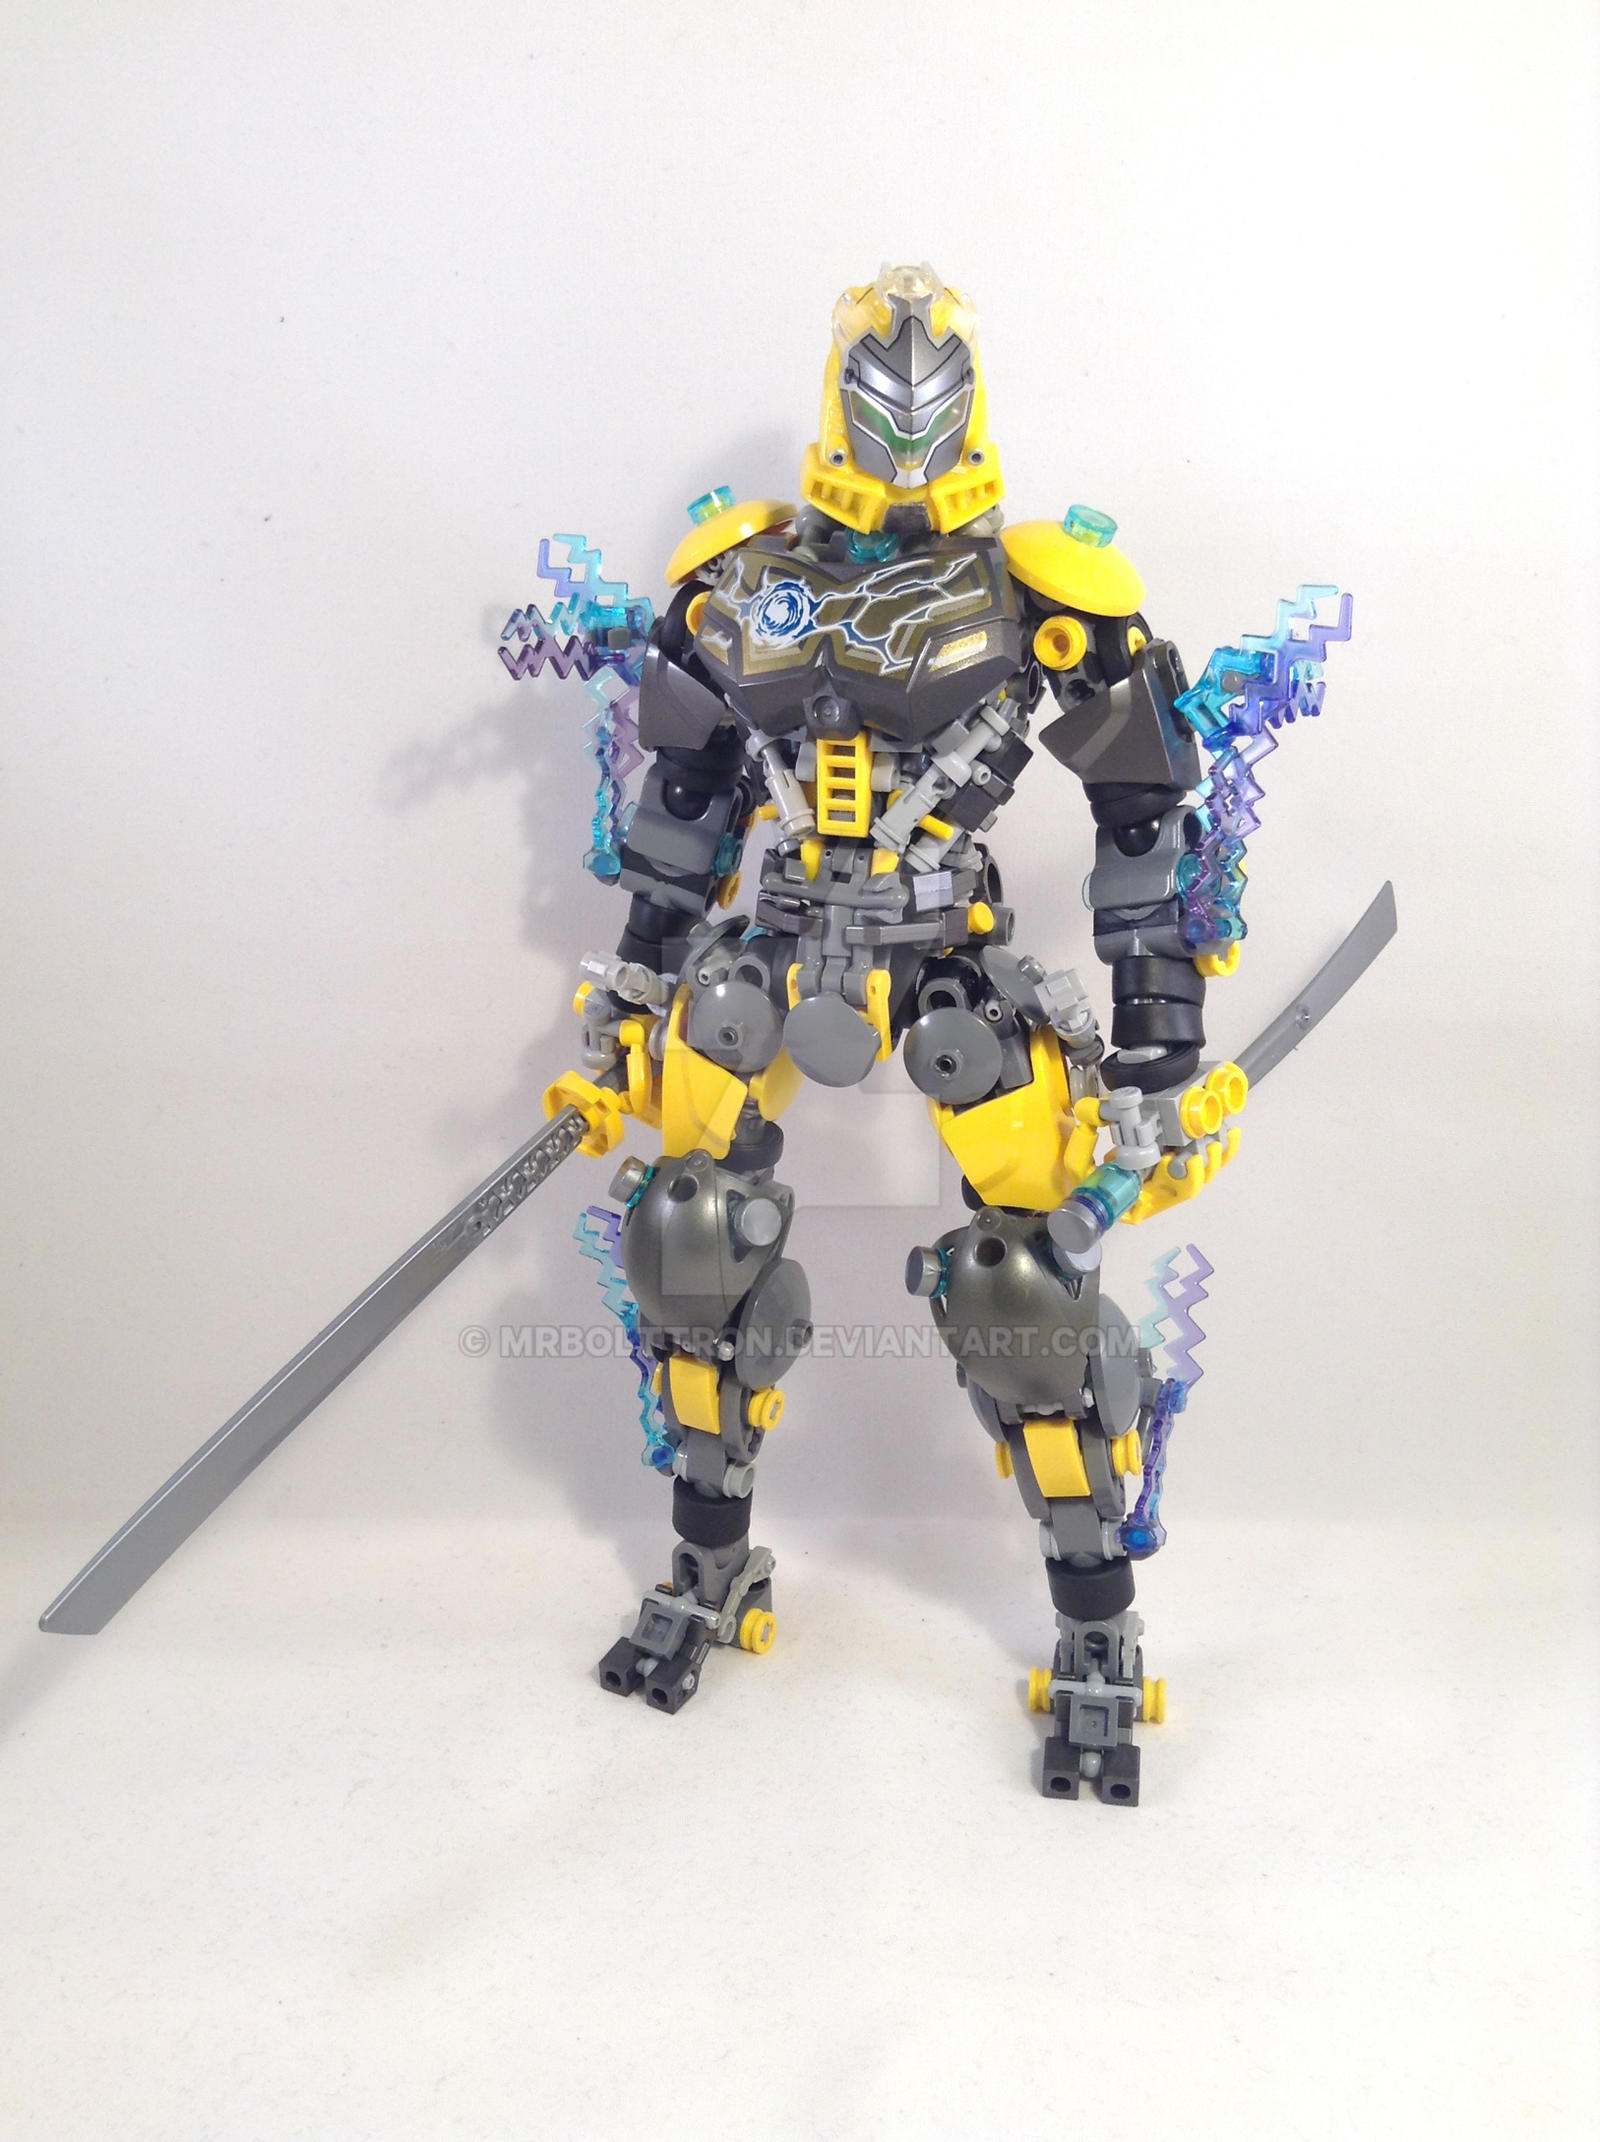 Bythalis, The Storm Ninja by MrBoltTron